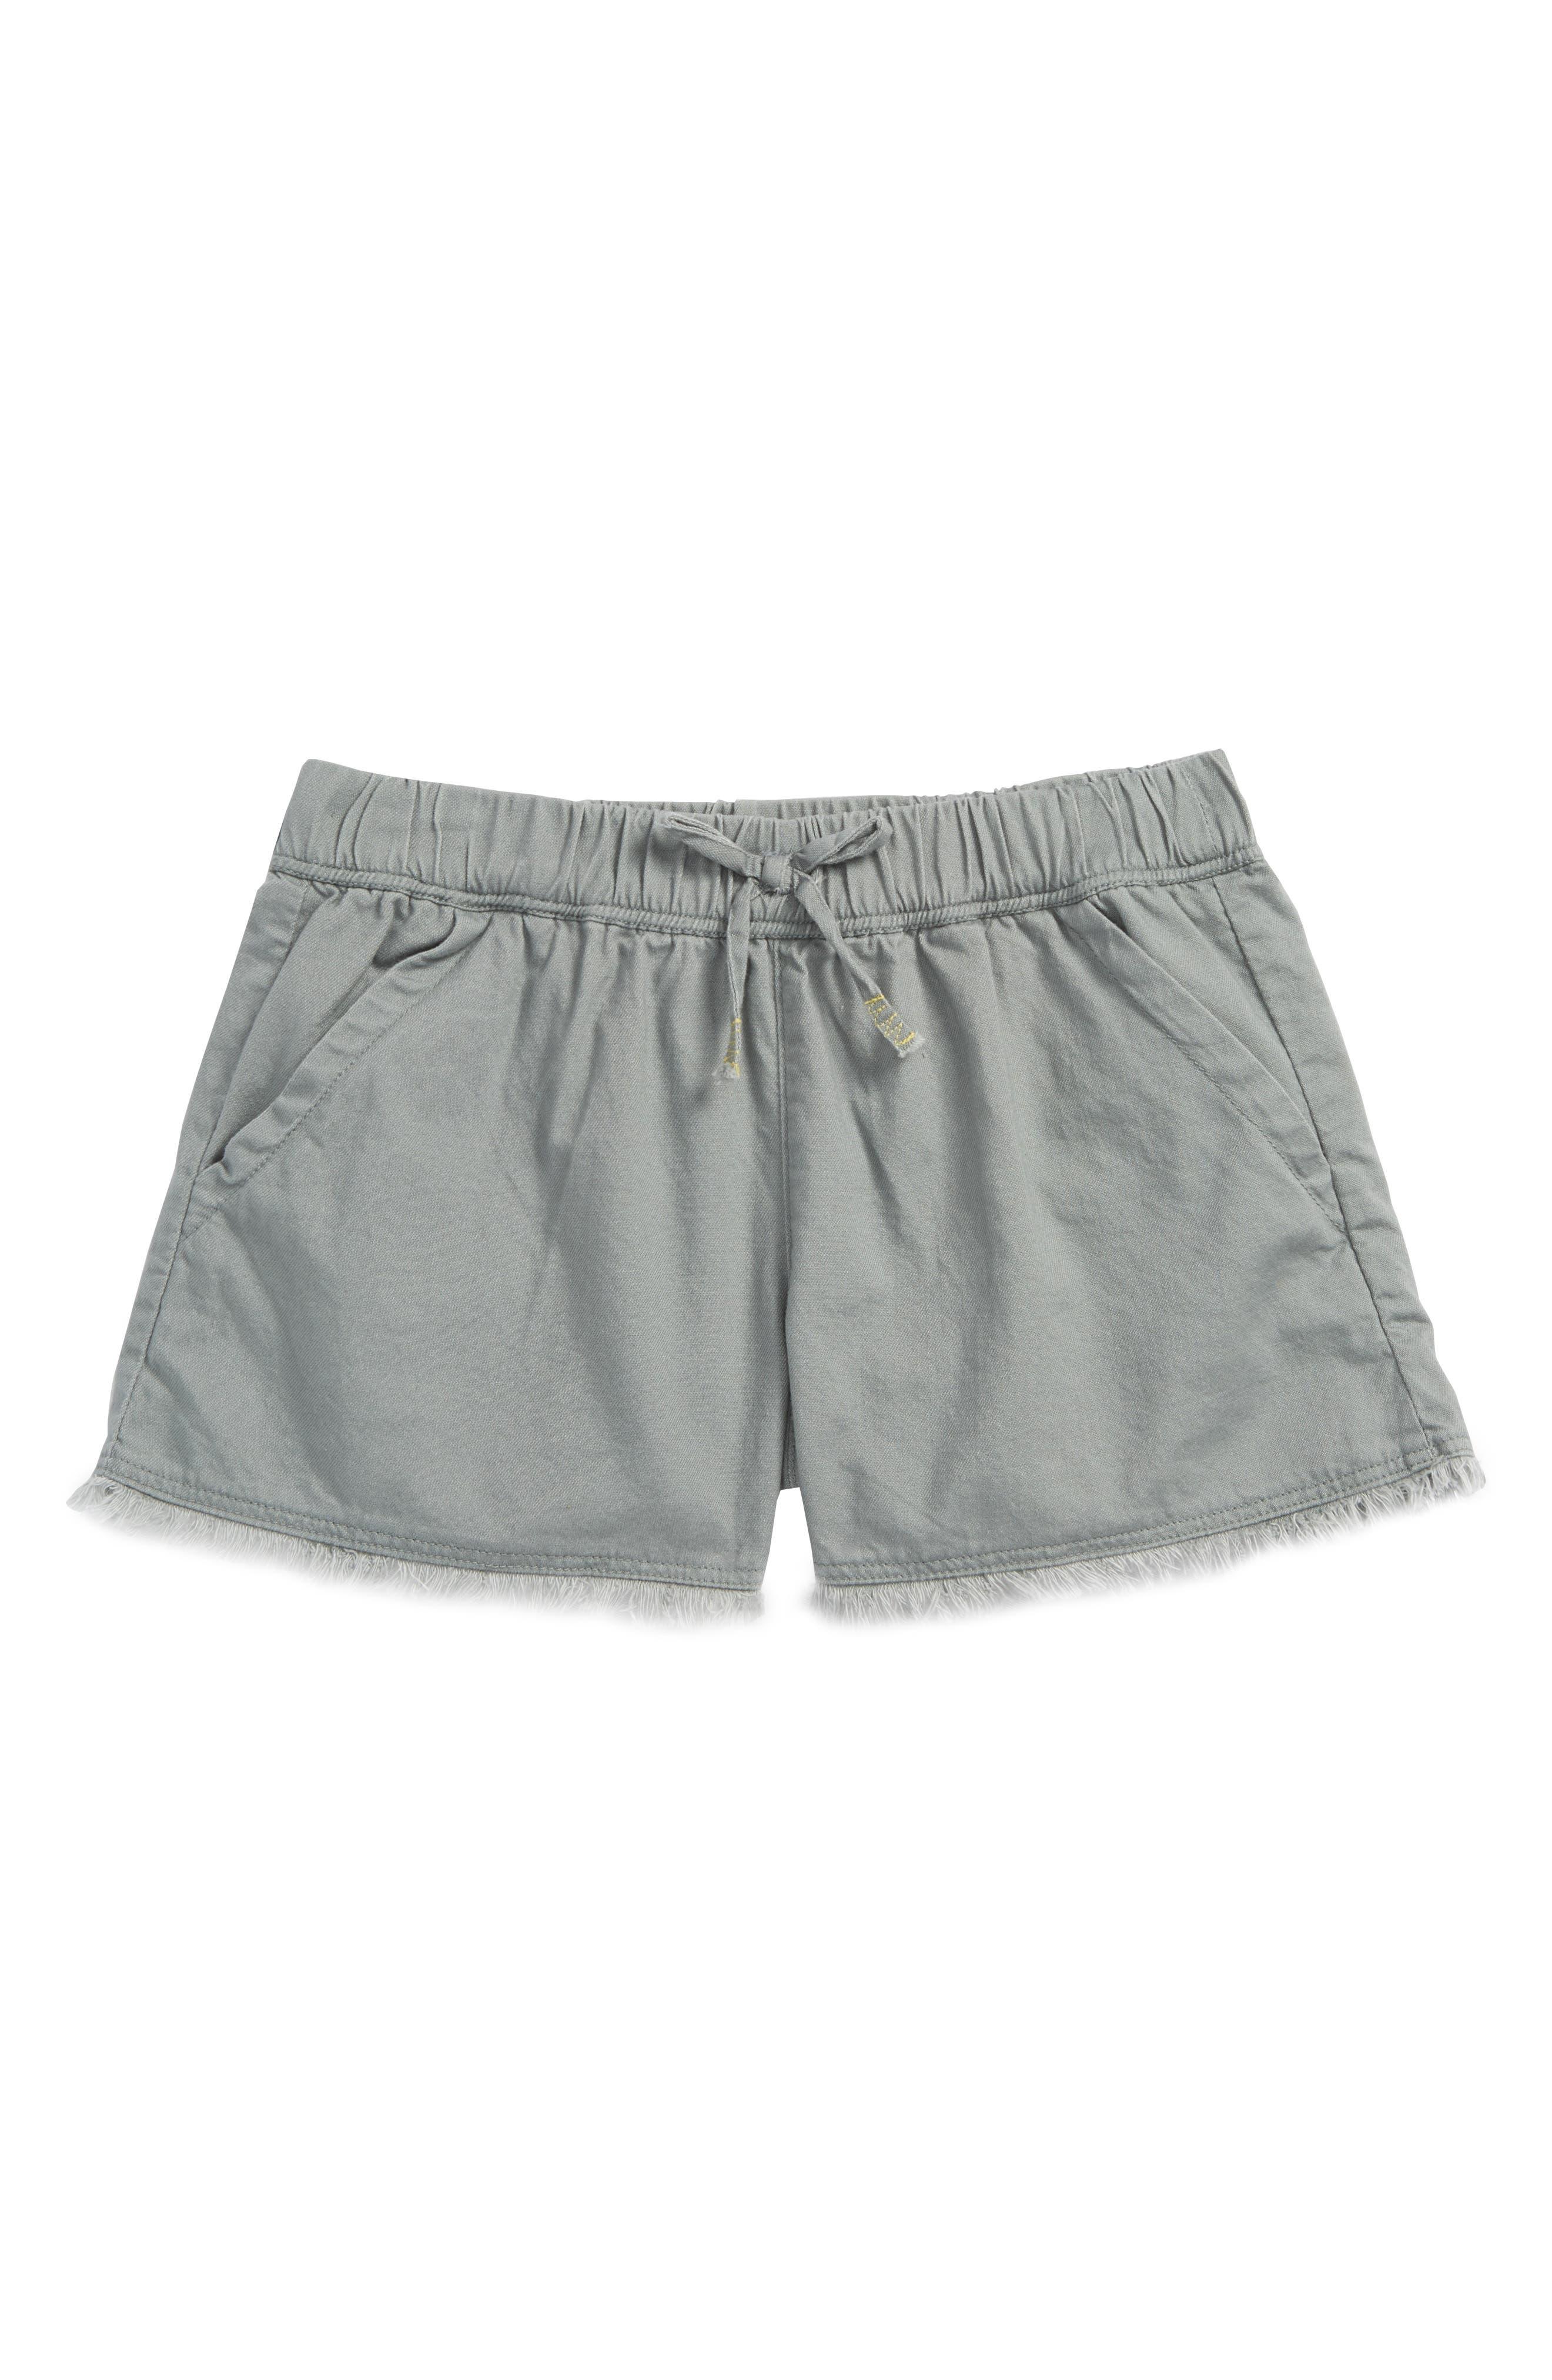 Twill Shorts,                         Main,                         color,